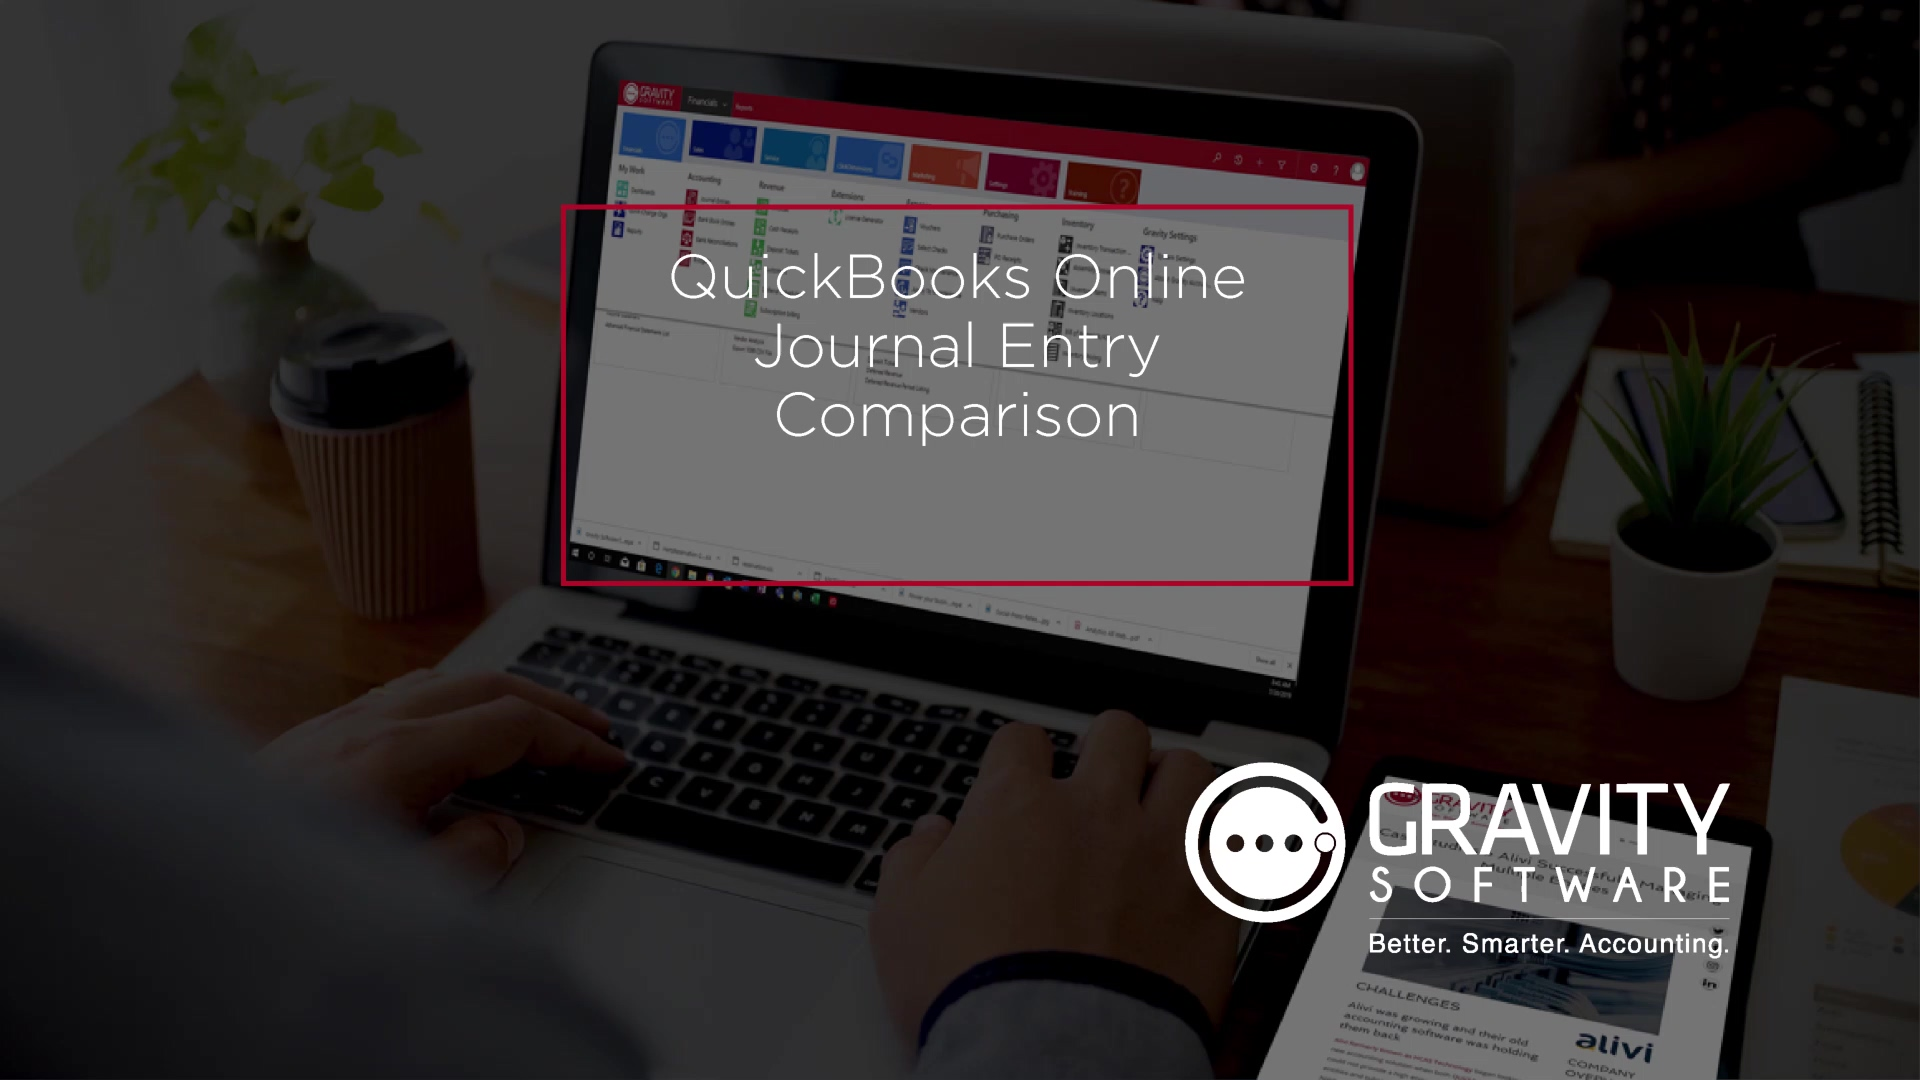 QuickBooks Online Journal Entry Comparison